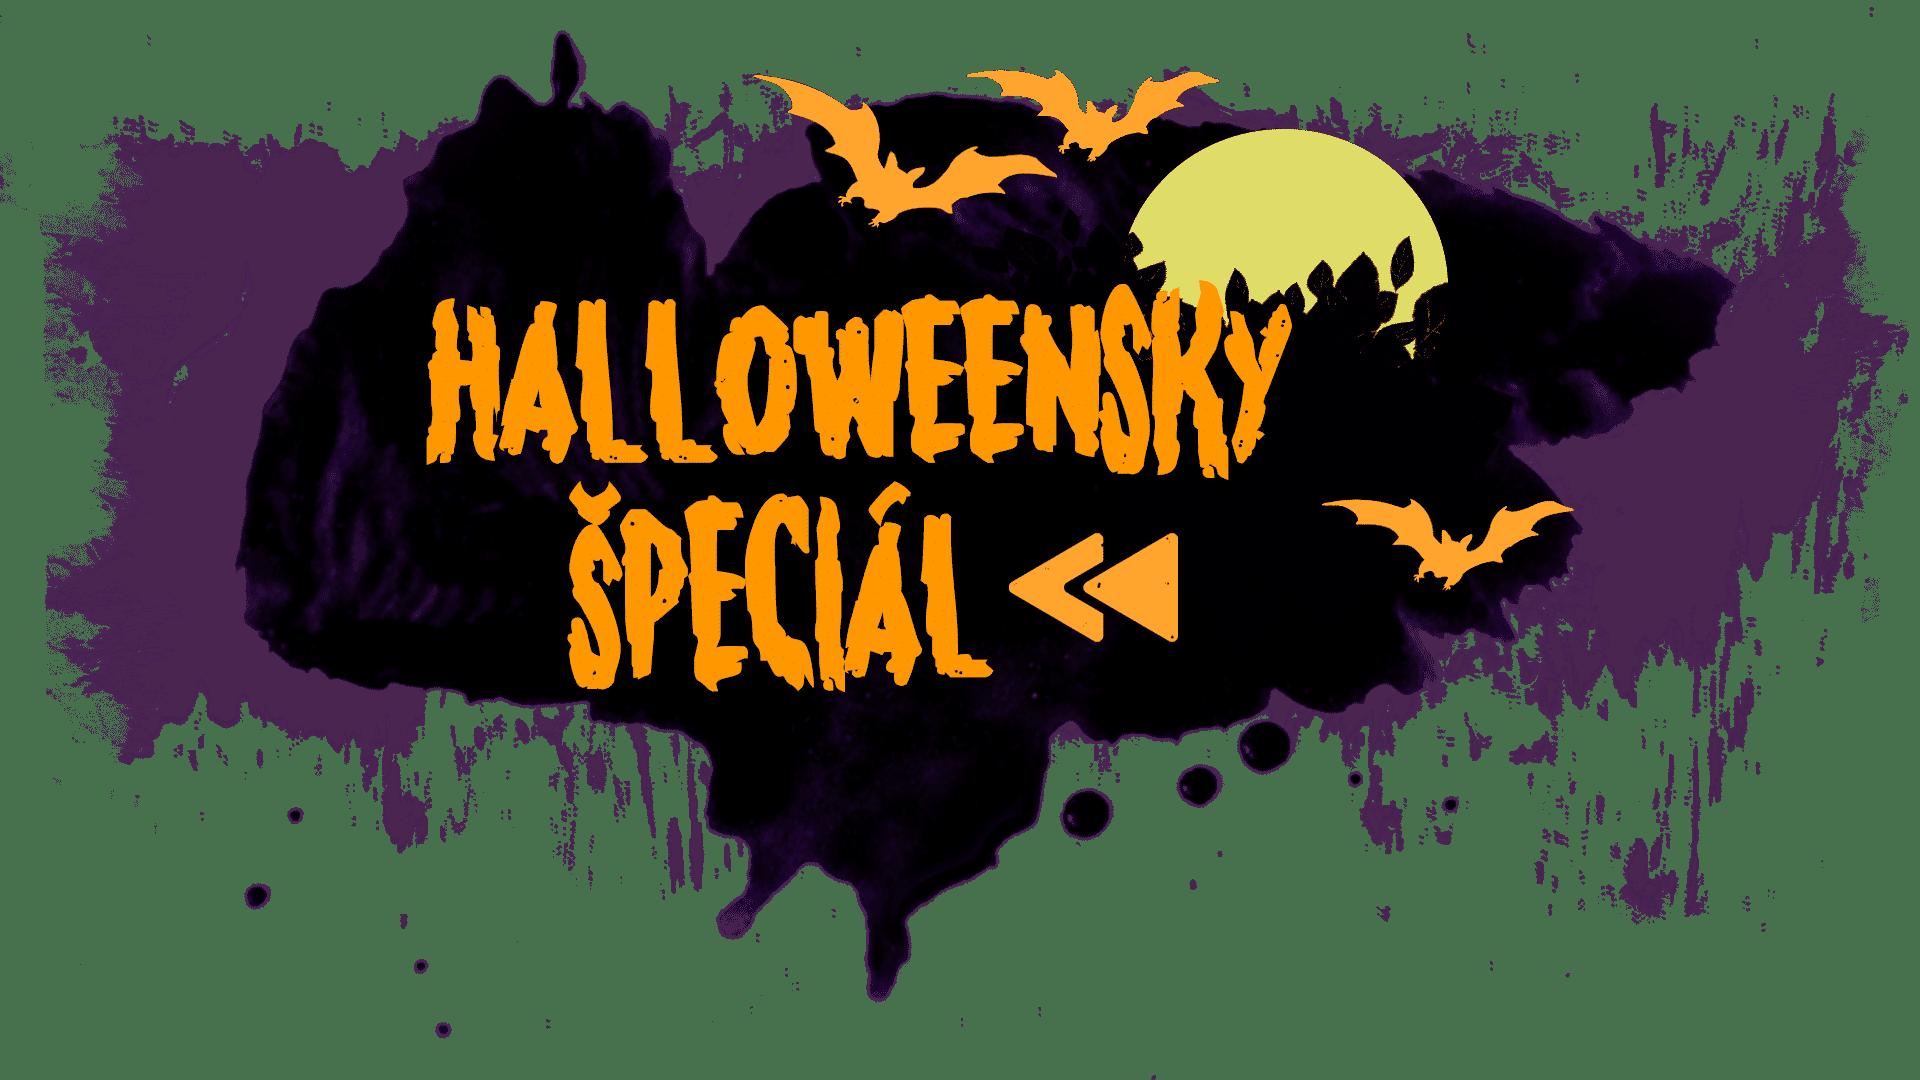 Halloweensky špeciál 2018